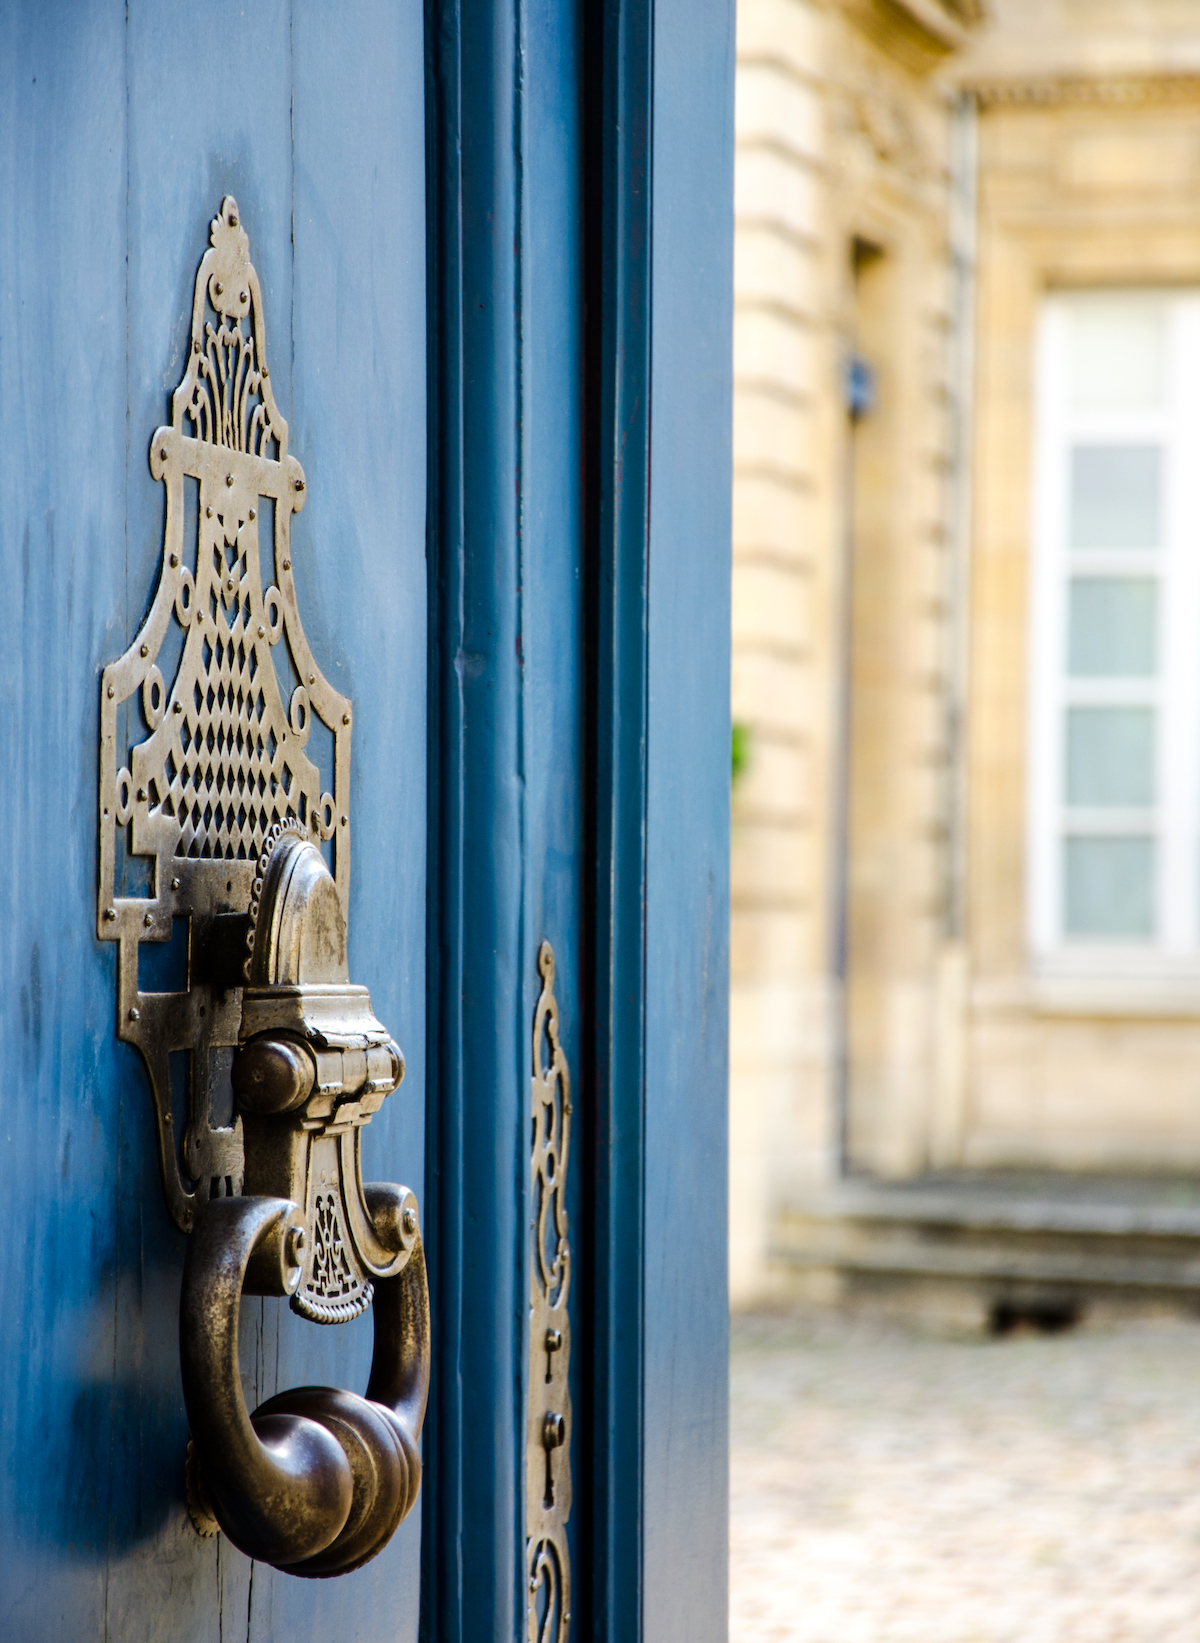 Porte, Bordeaux ©MickaelLG33 shutterstock